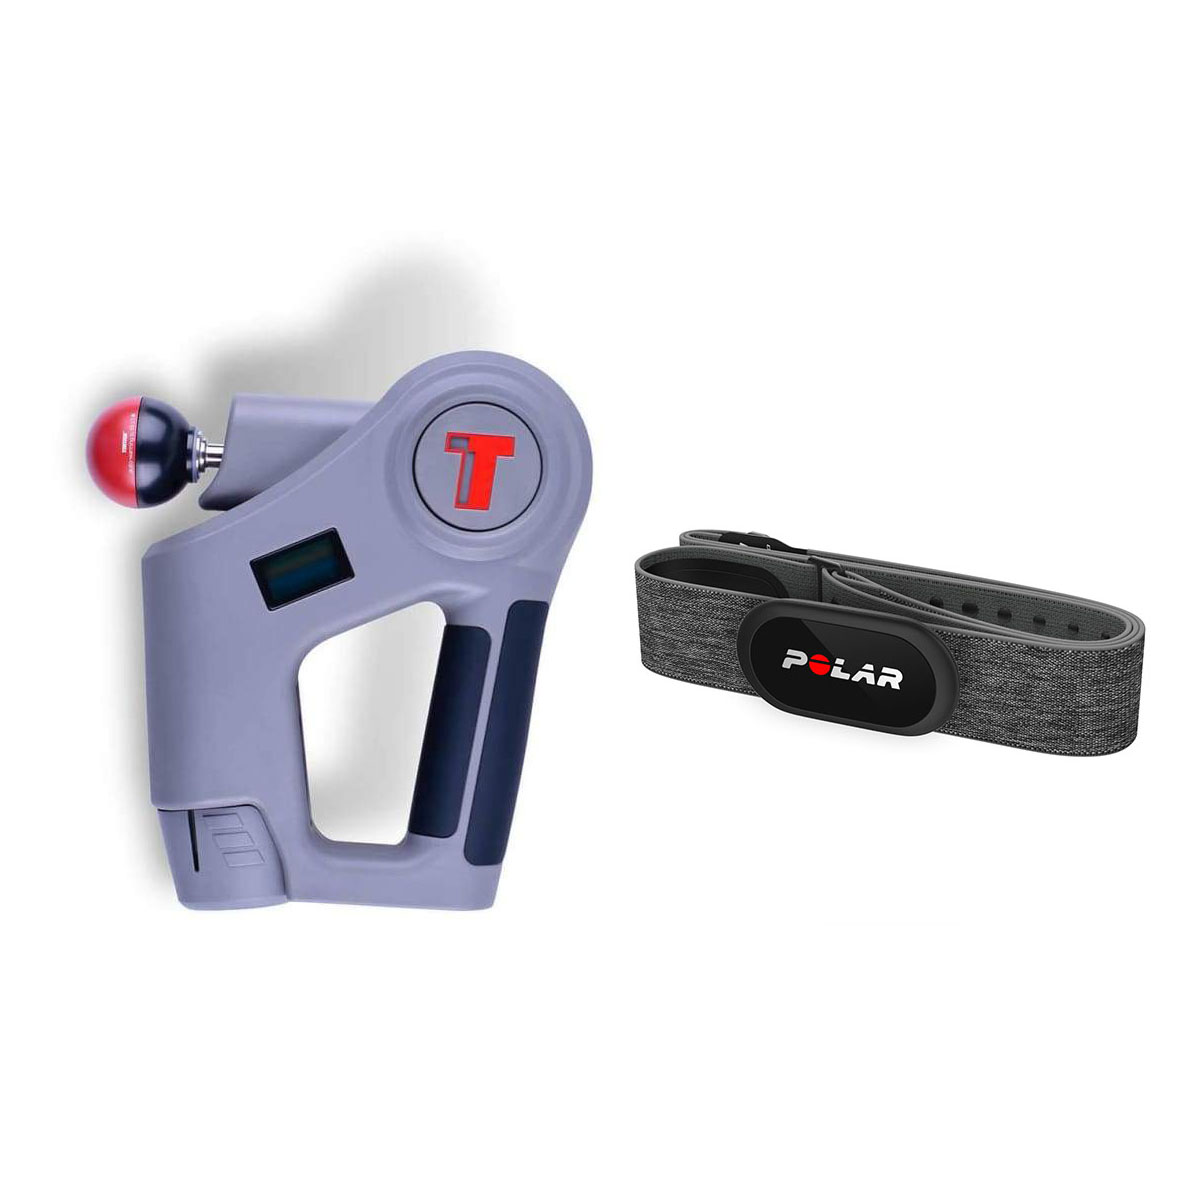 Комплект - Перкуссионный мышечный массажер TimTam Pro Power Massager + Пульсометр Polar H10 N